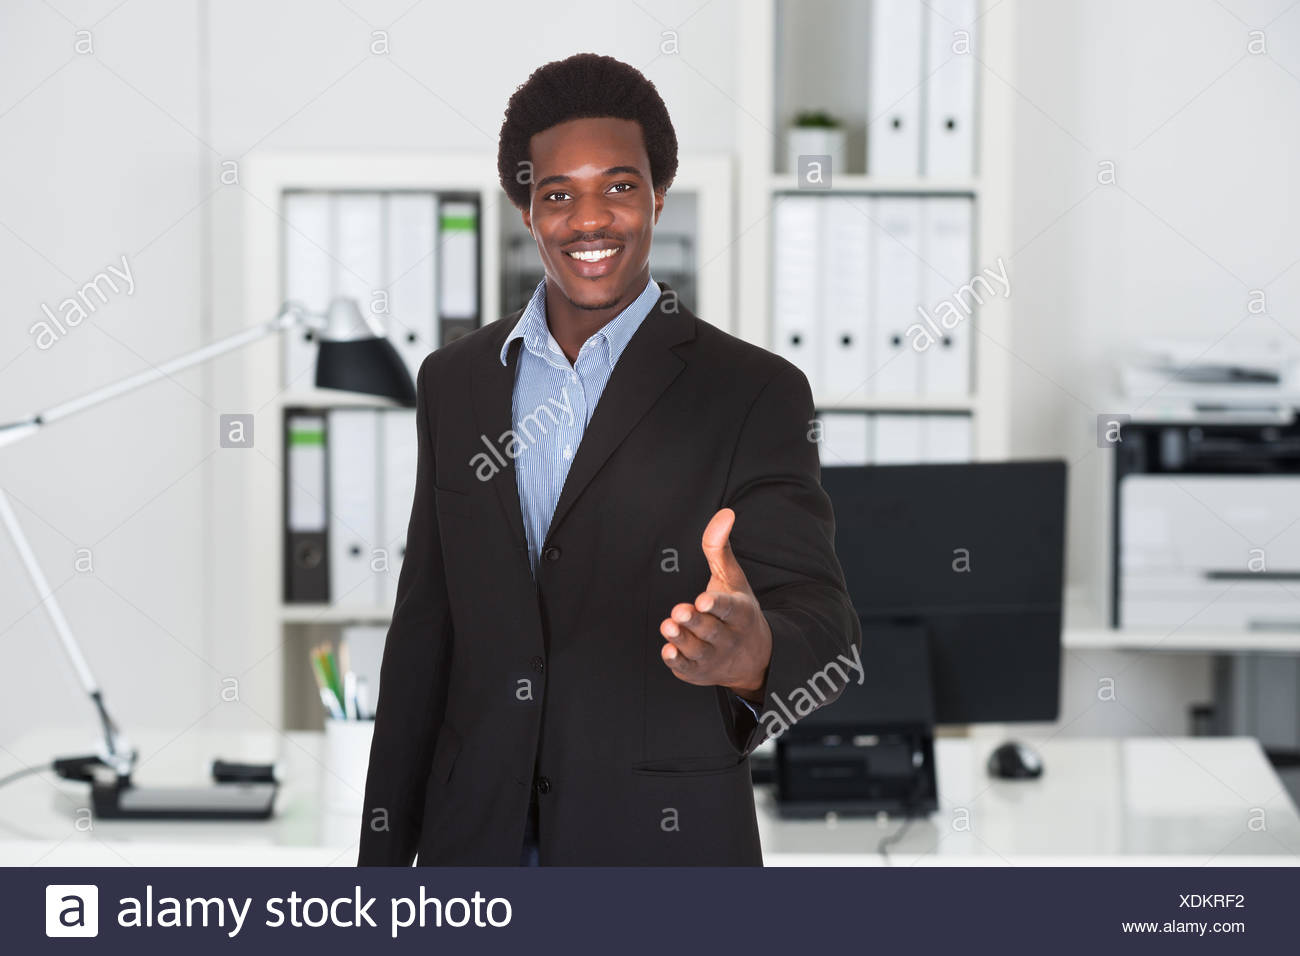 Businessman Offering Handshake - Stock Image